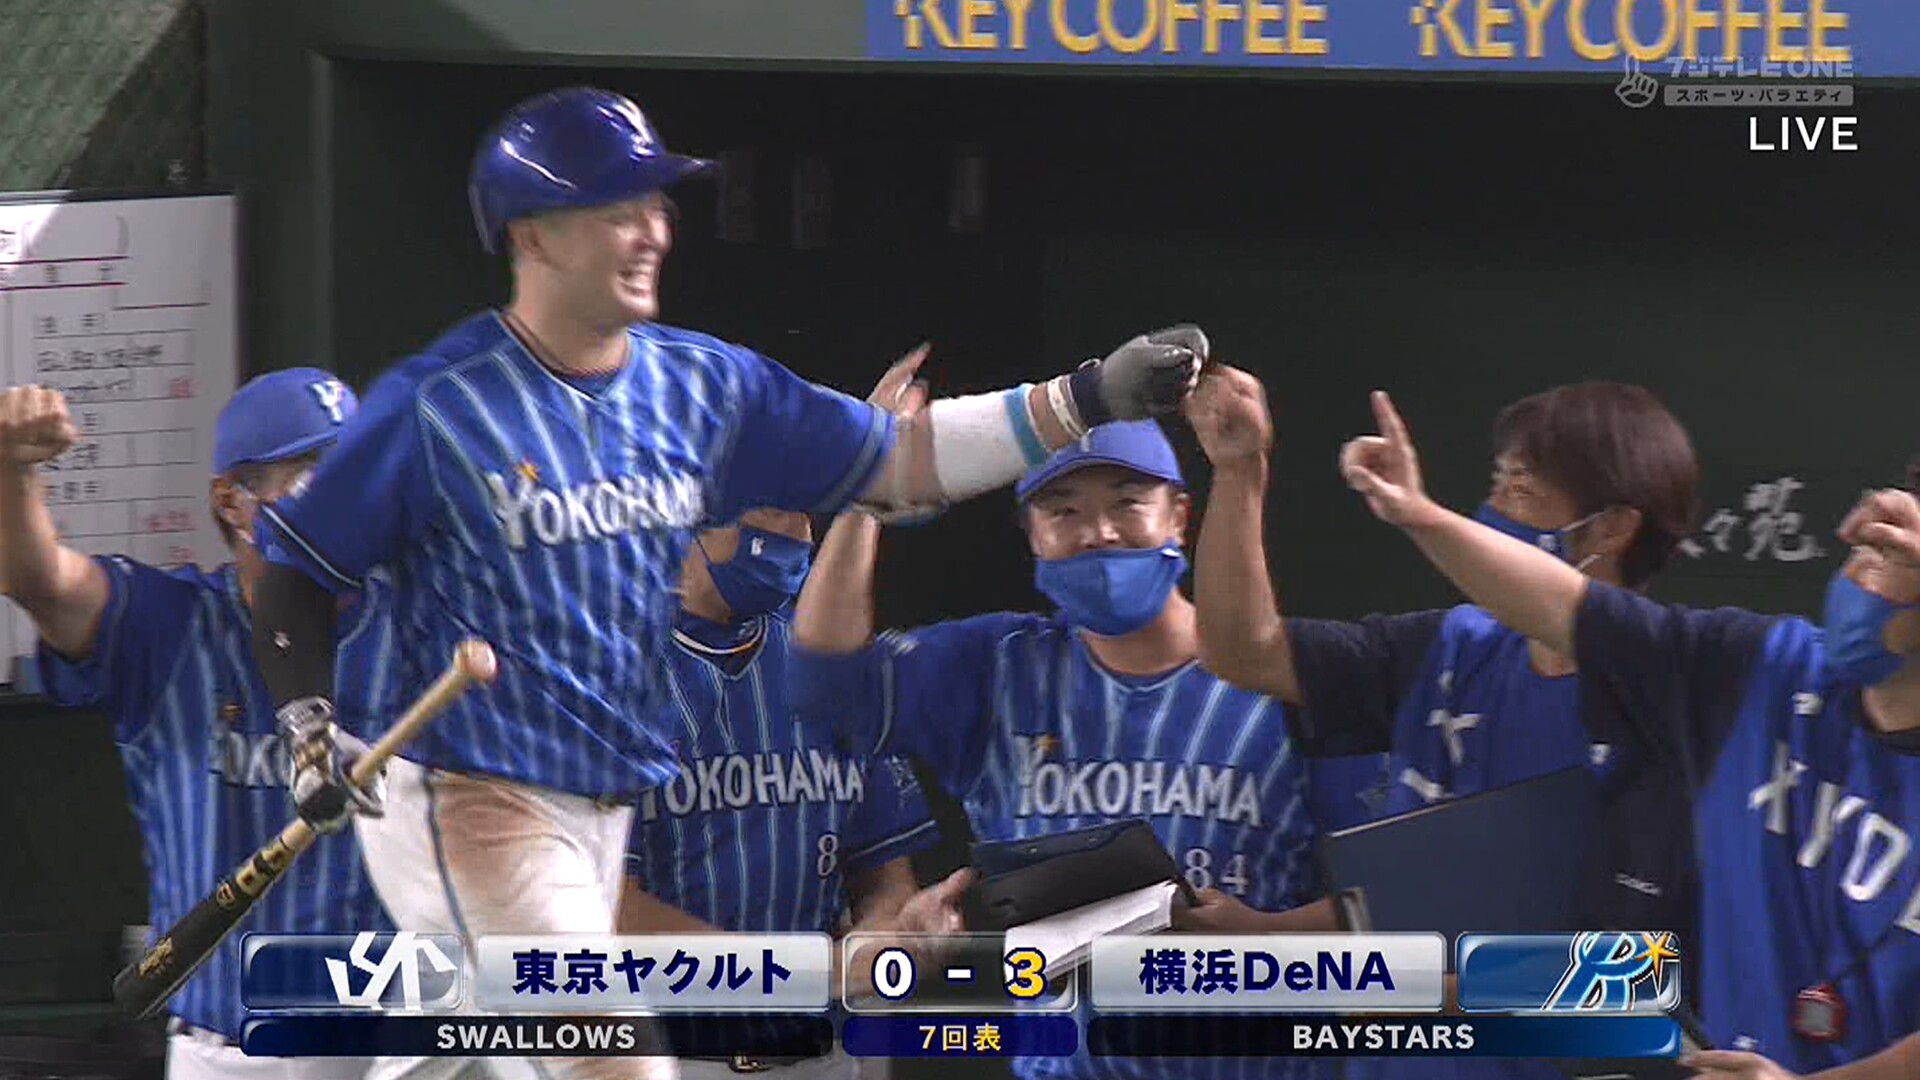 DeNA、宮崎→ソト→牧が3者連続ホームラン!!!